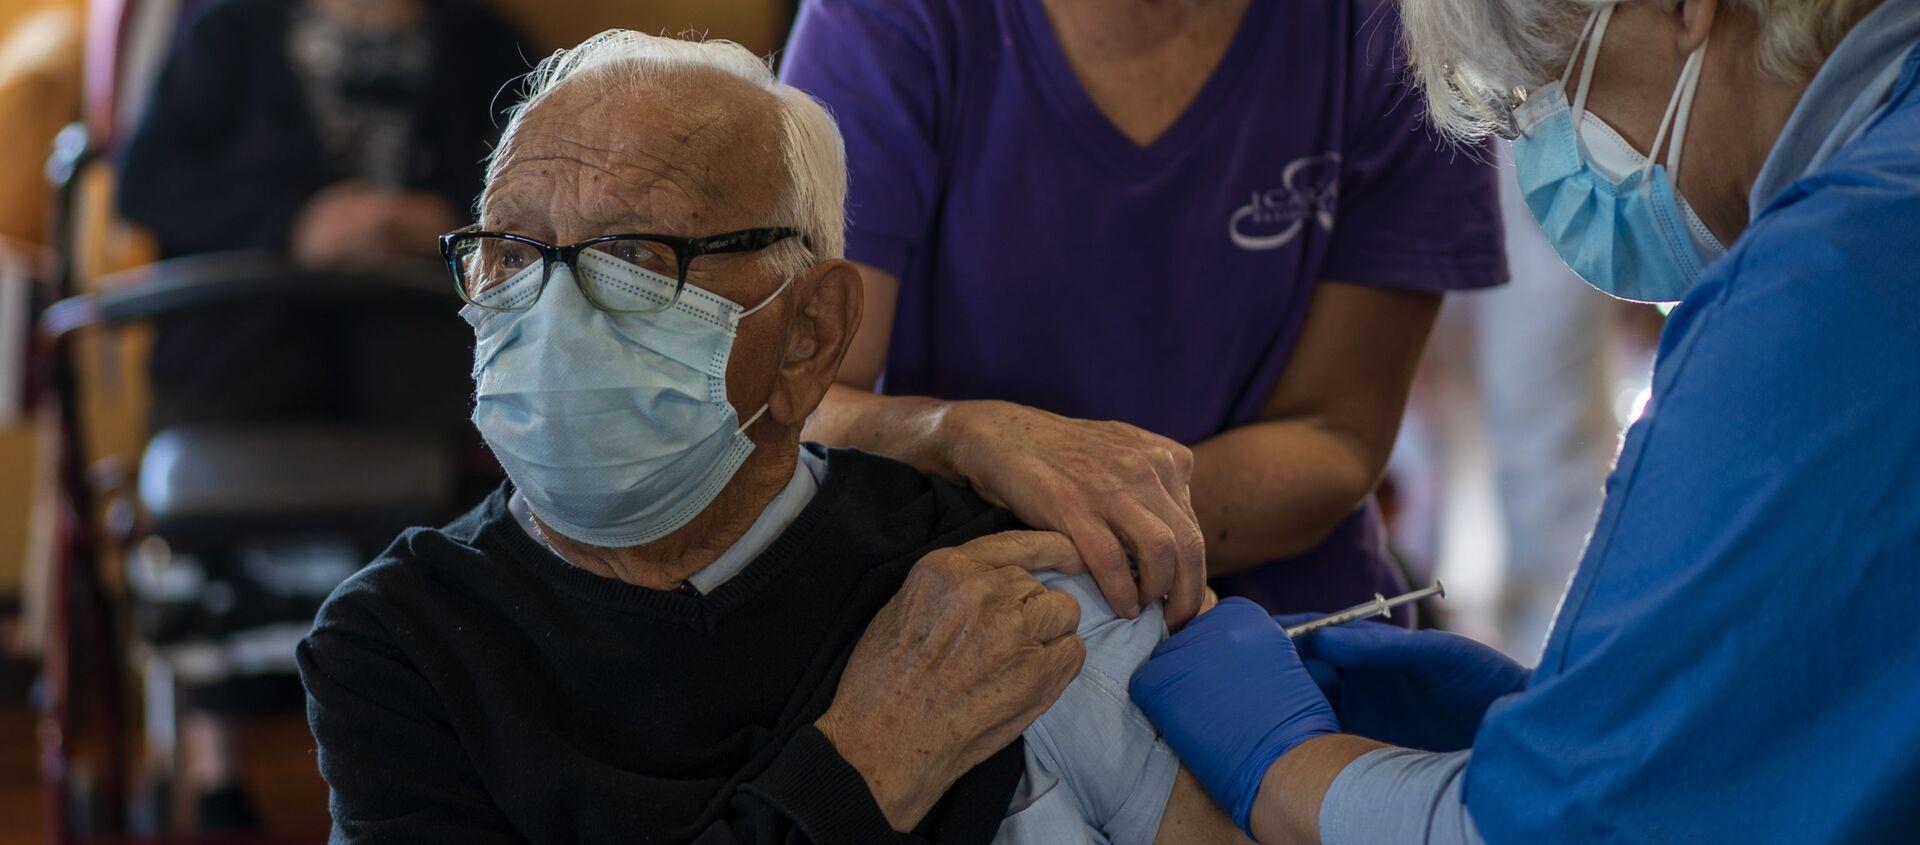 Una enfermera administra la vacuna Pfizer-BioNTech COVID-19 a un anciana en Barcelona - Sputnik Mundo, 1920, 14.01.2021